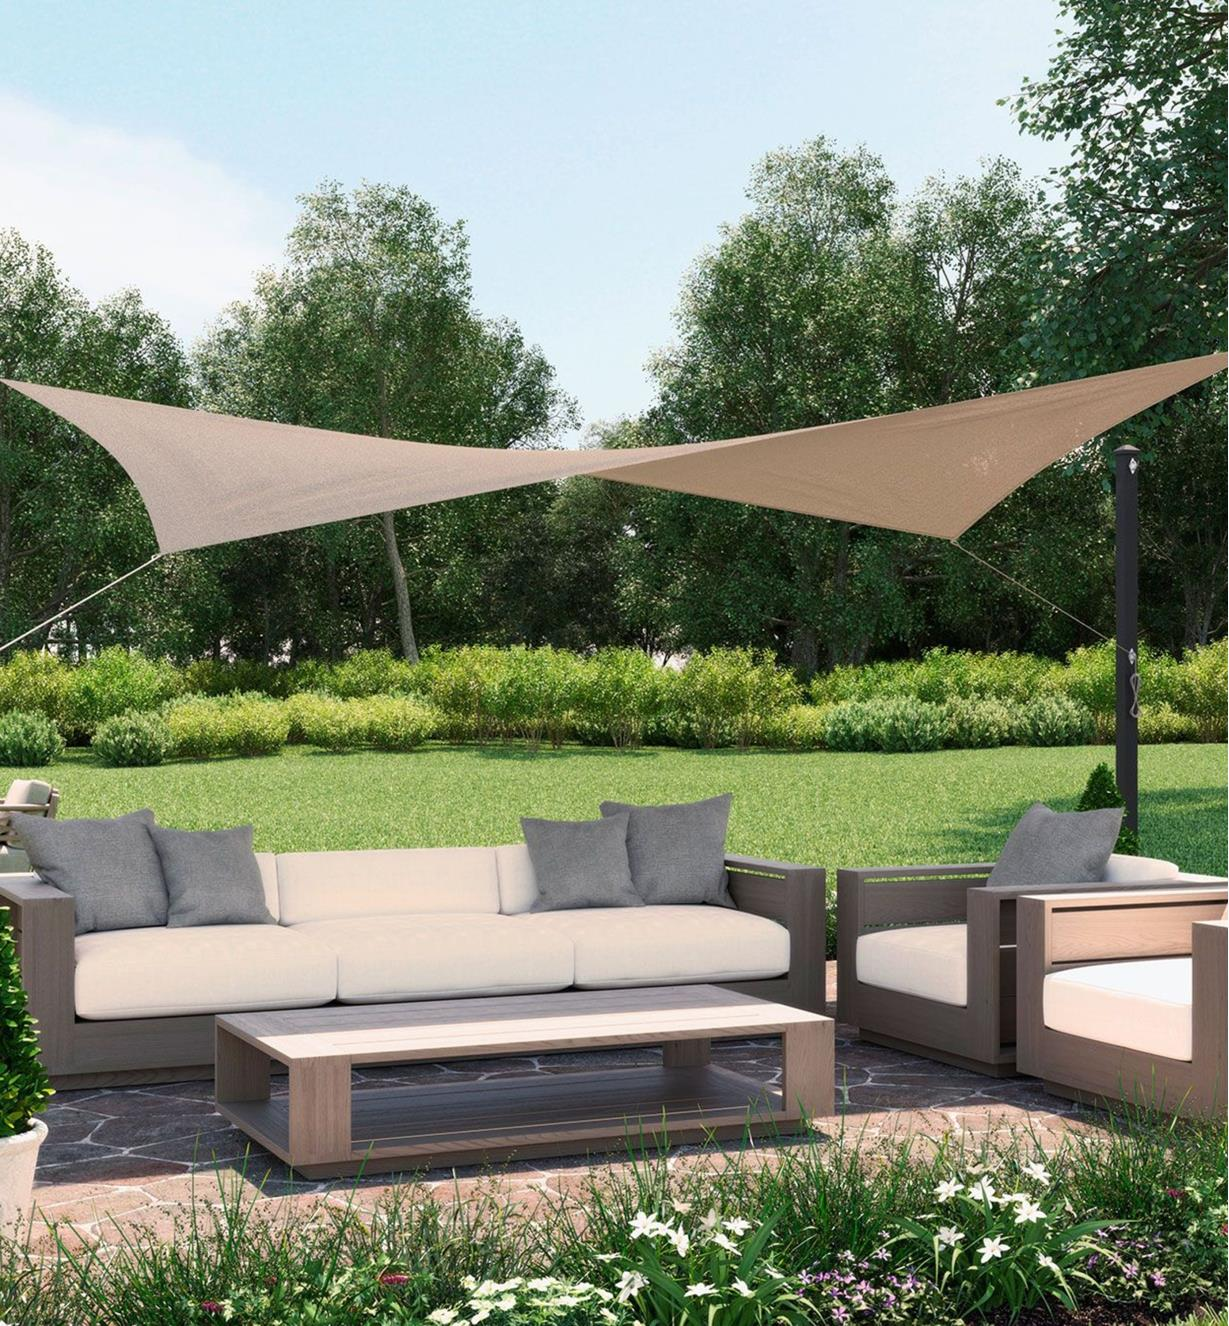 A square shade sail shades a patio seating area